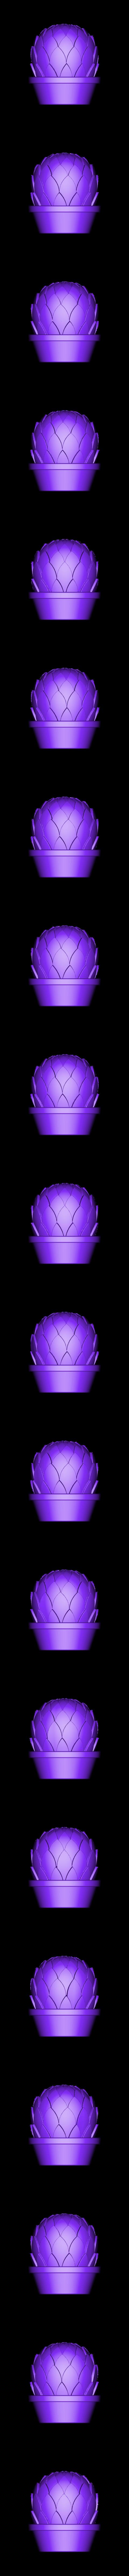 arti1+shortpot.stl Download free STL file Small potted succulents • 3D printing model, tone001